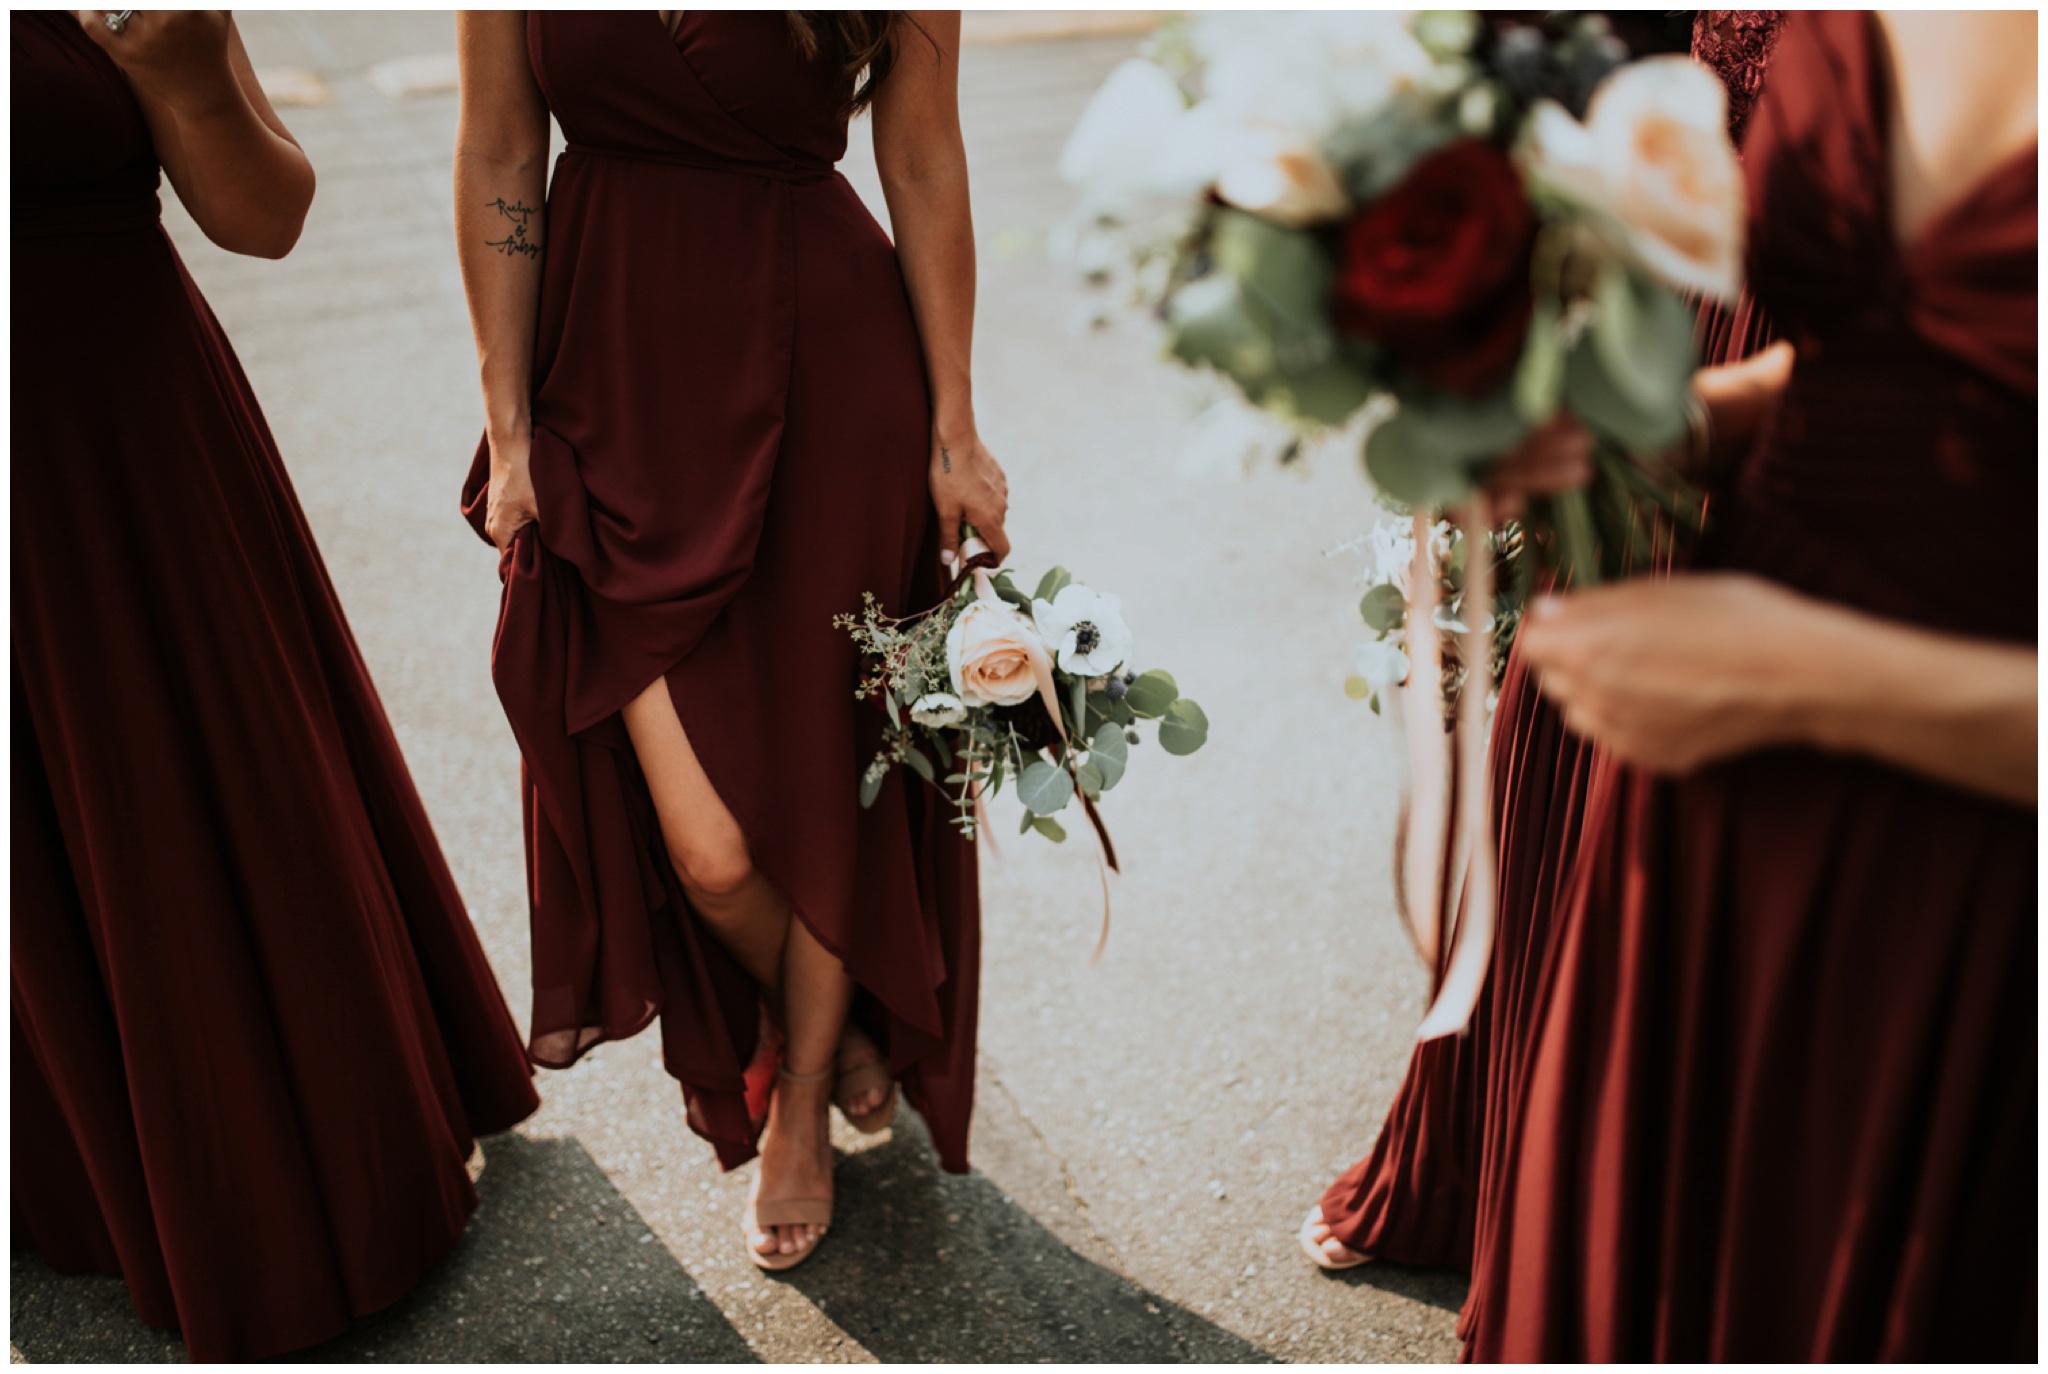 alyssa-keiran-westland-distillery-urban-seattle-wedding-photographer-caitlyn-nikula-86.jpg